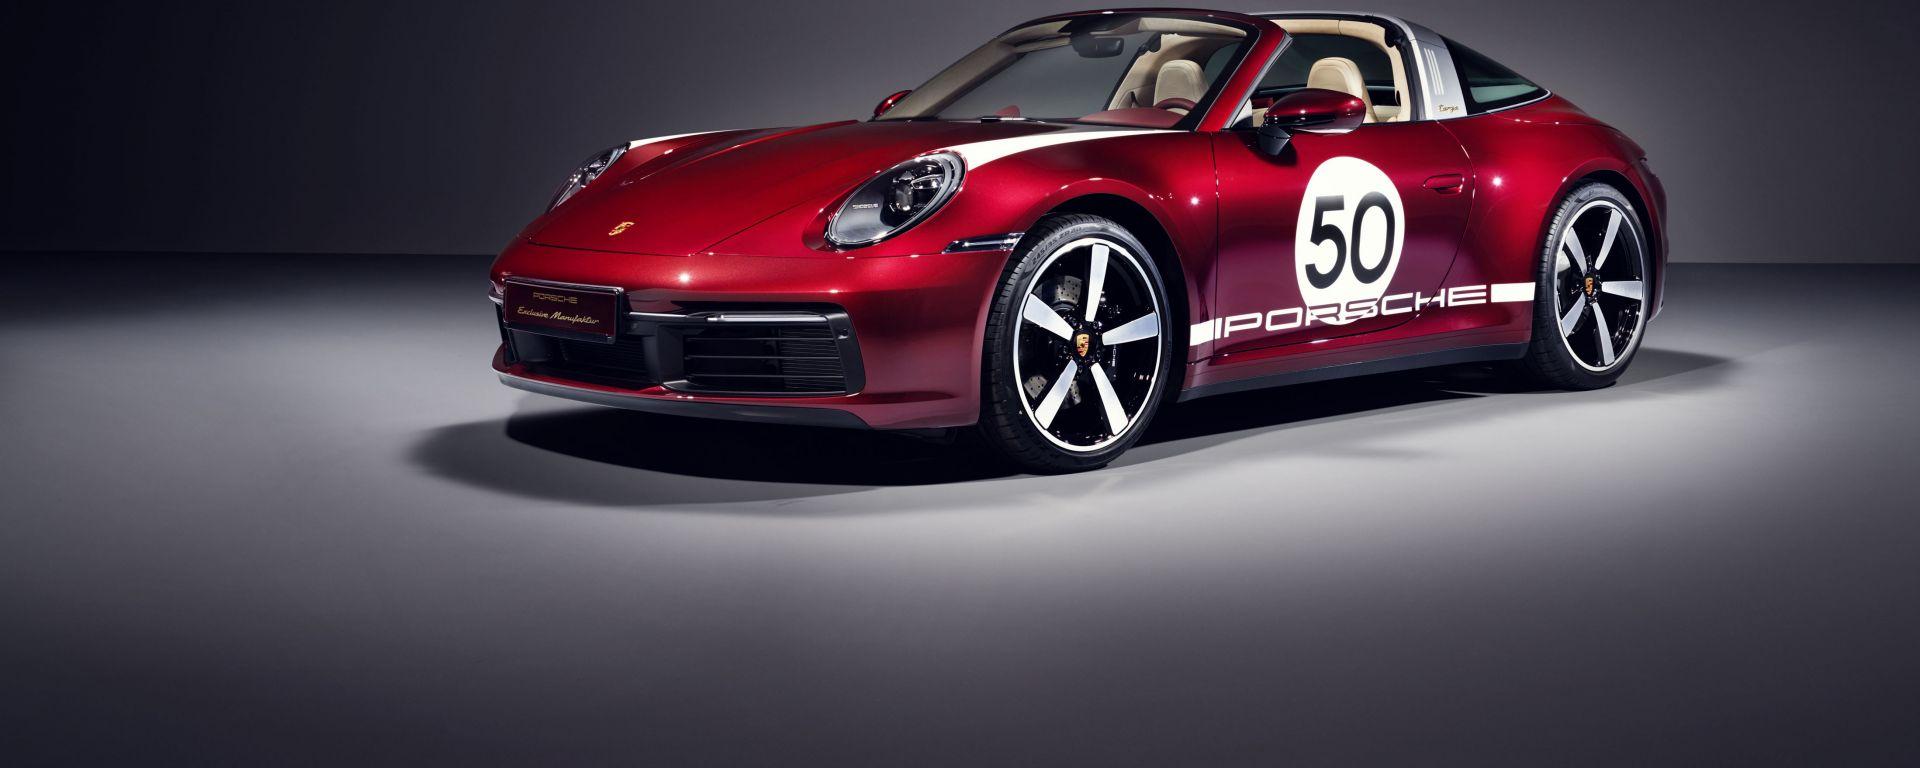 Porsche 911 Targa 4S Heritage Design Edition: il frontale